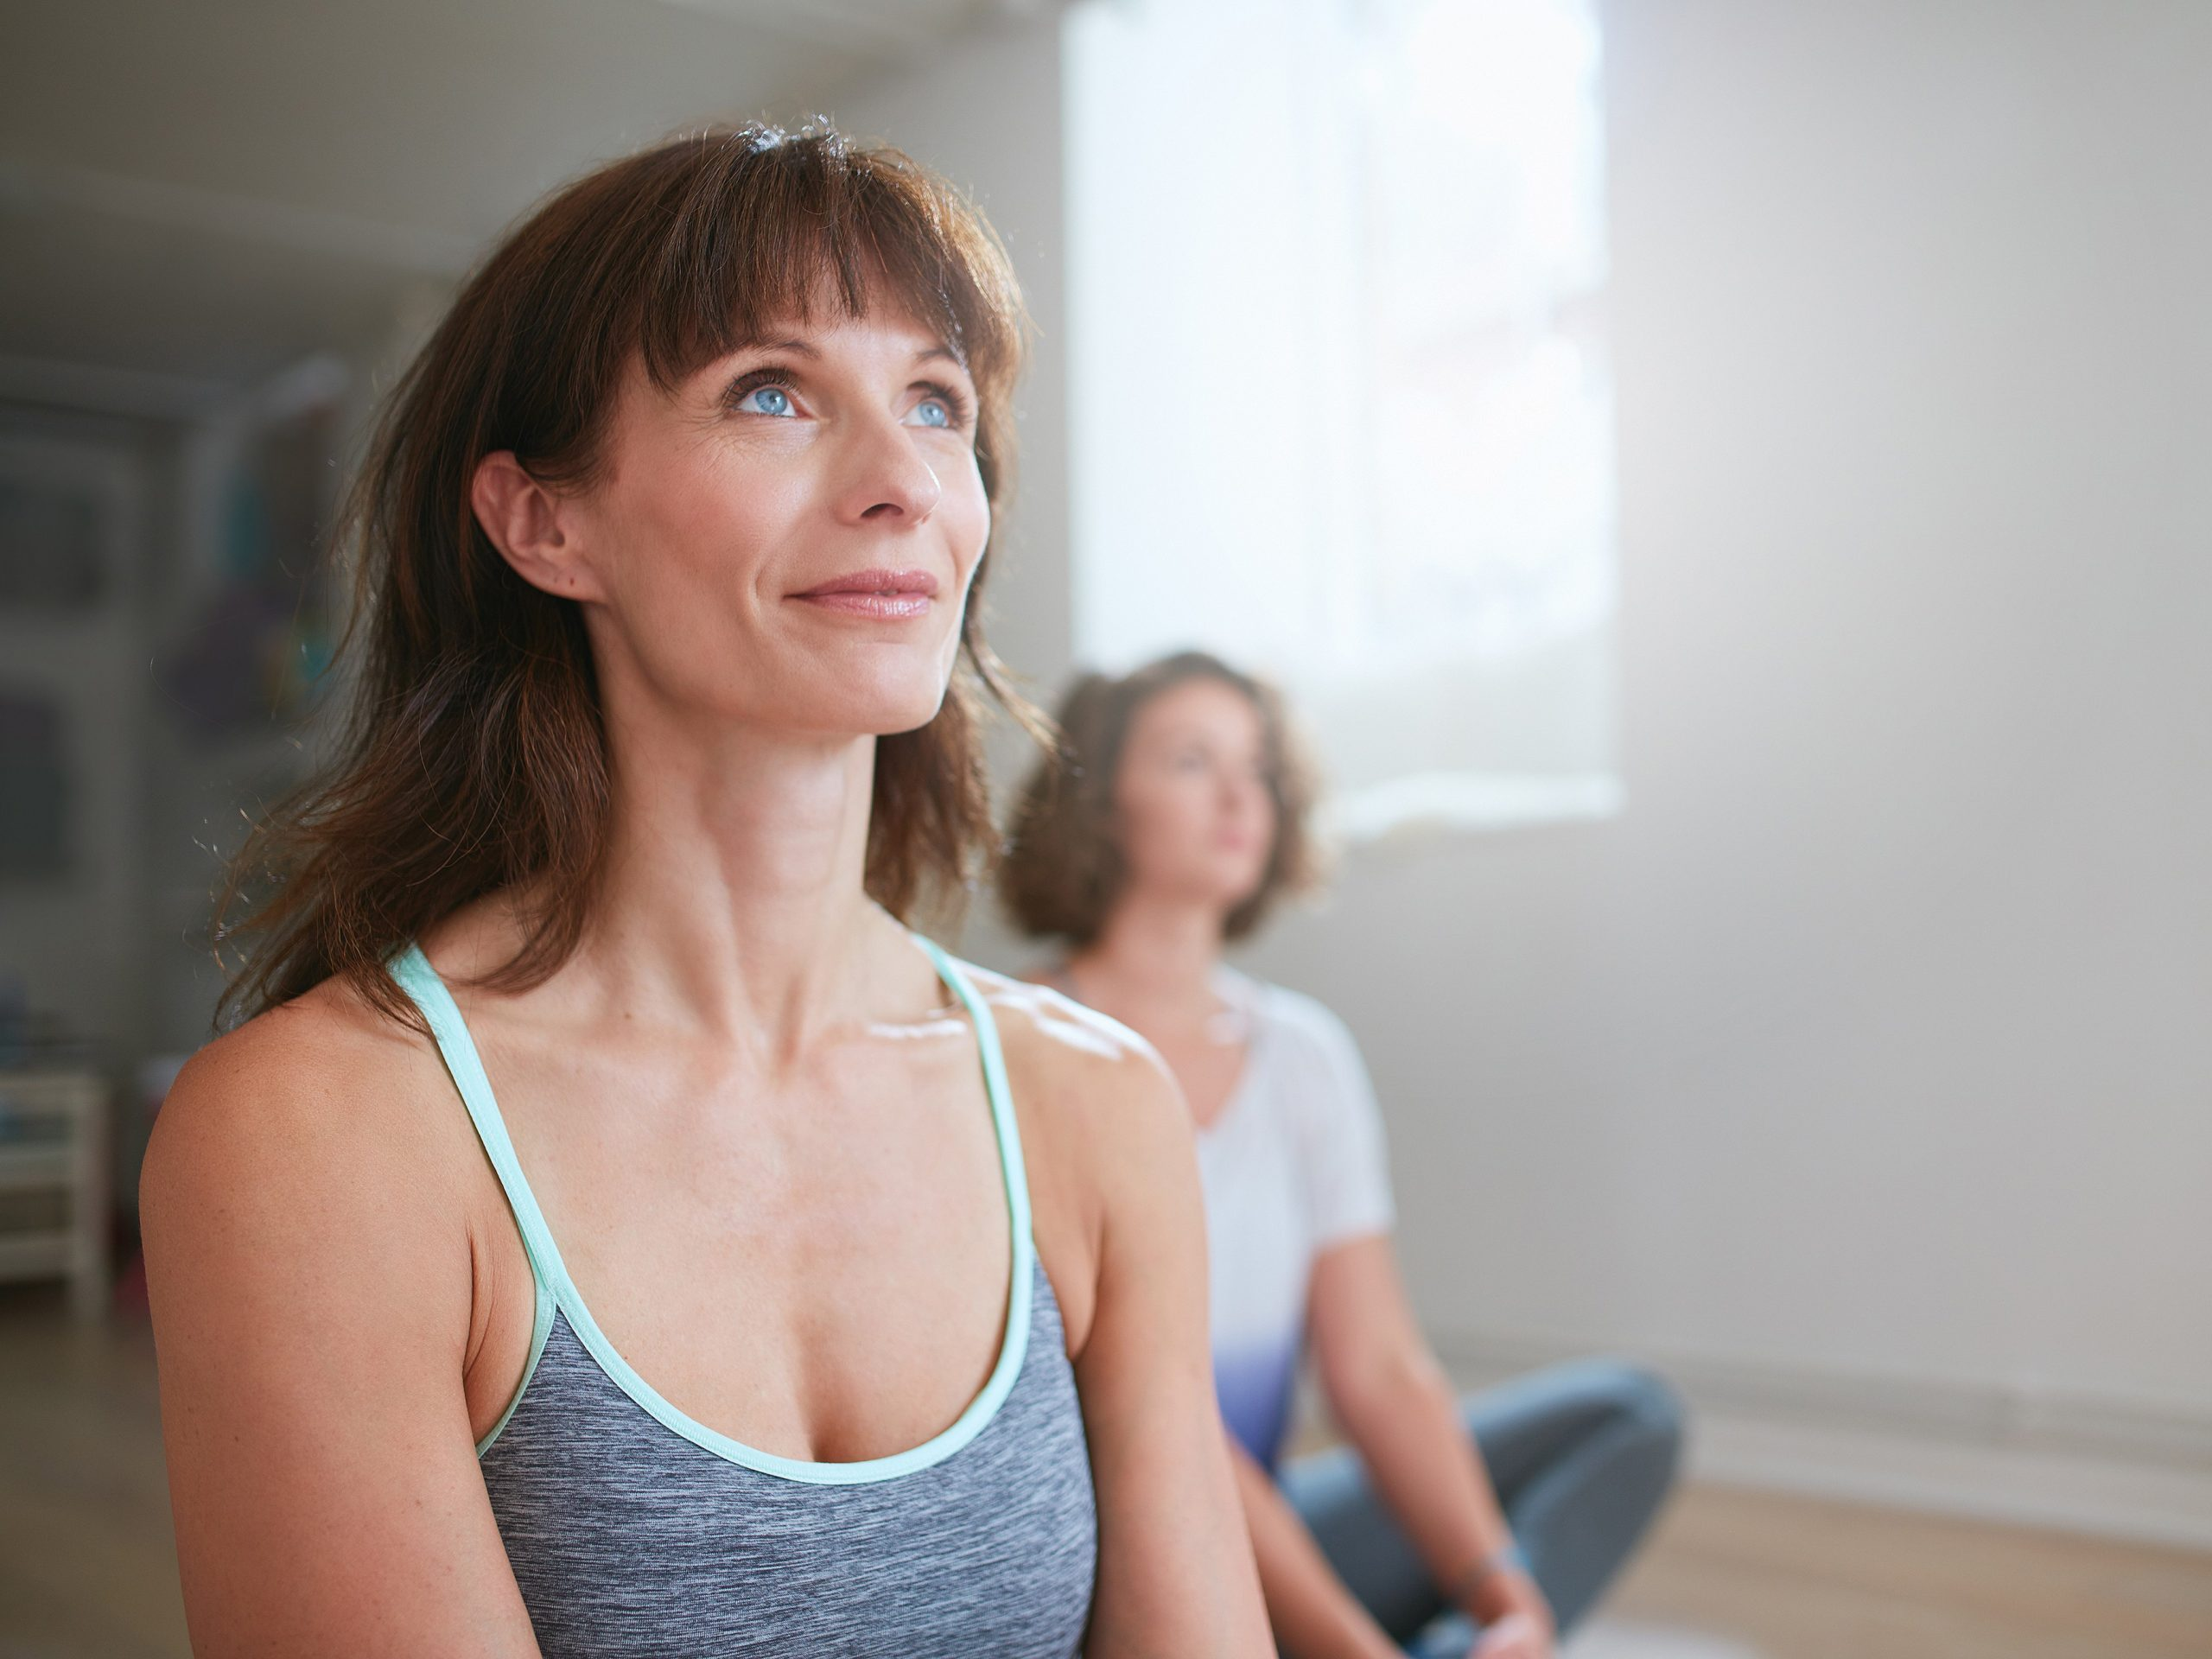 7 Drug-Free Ways to Treat Menopause Symptoms